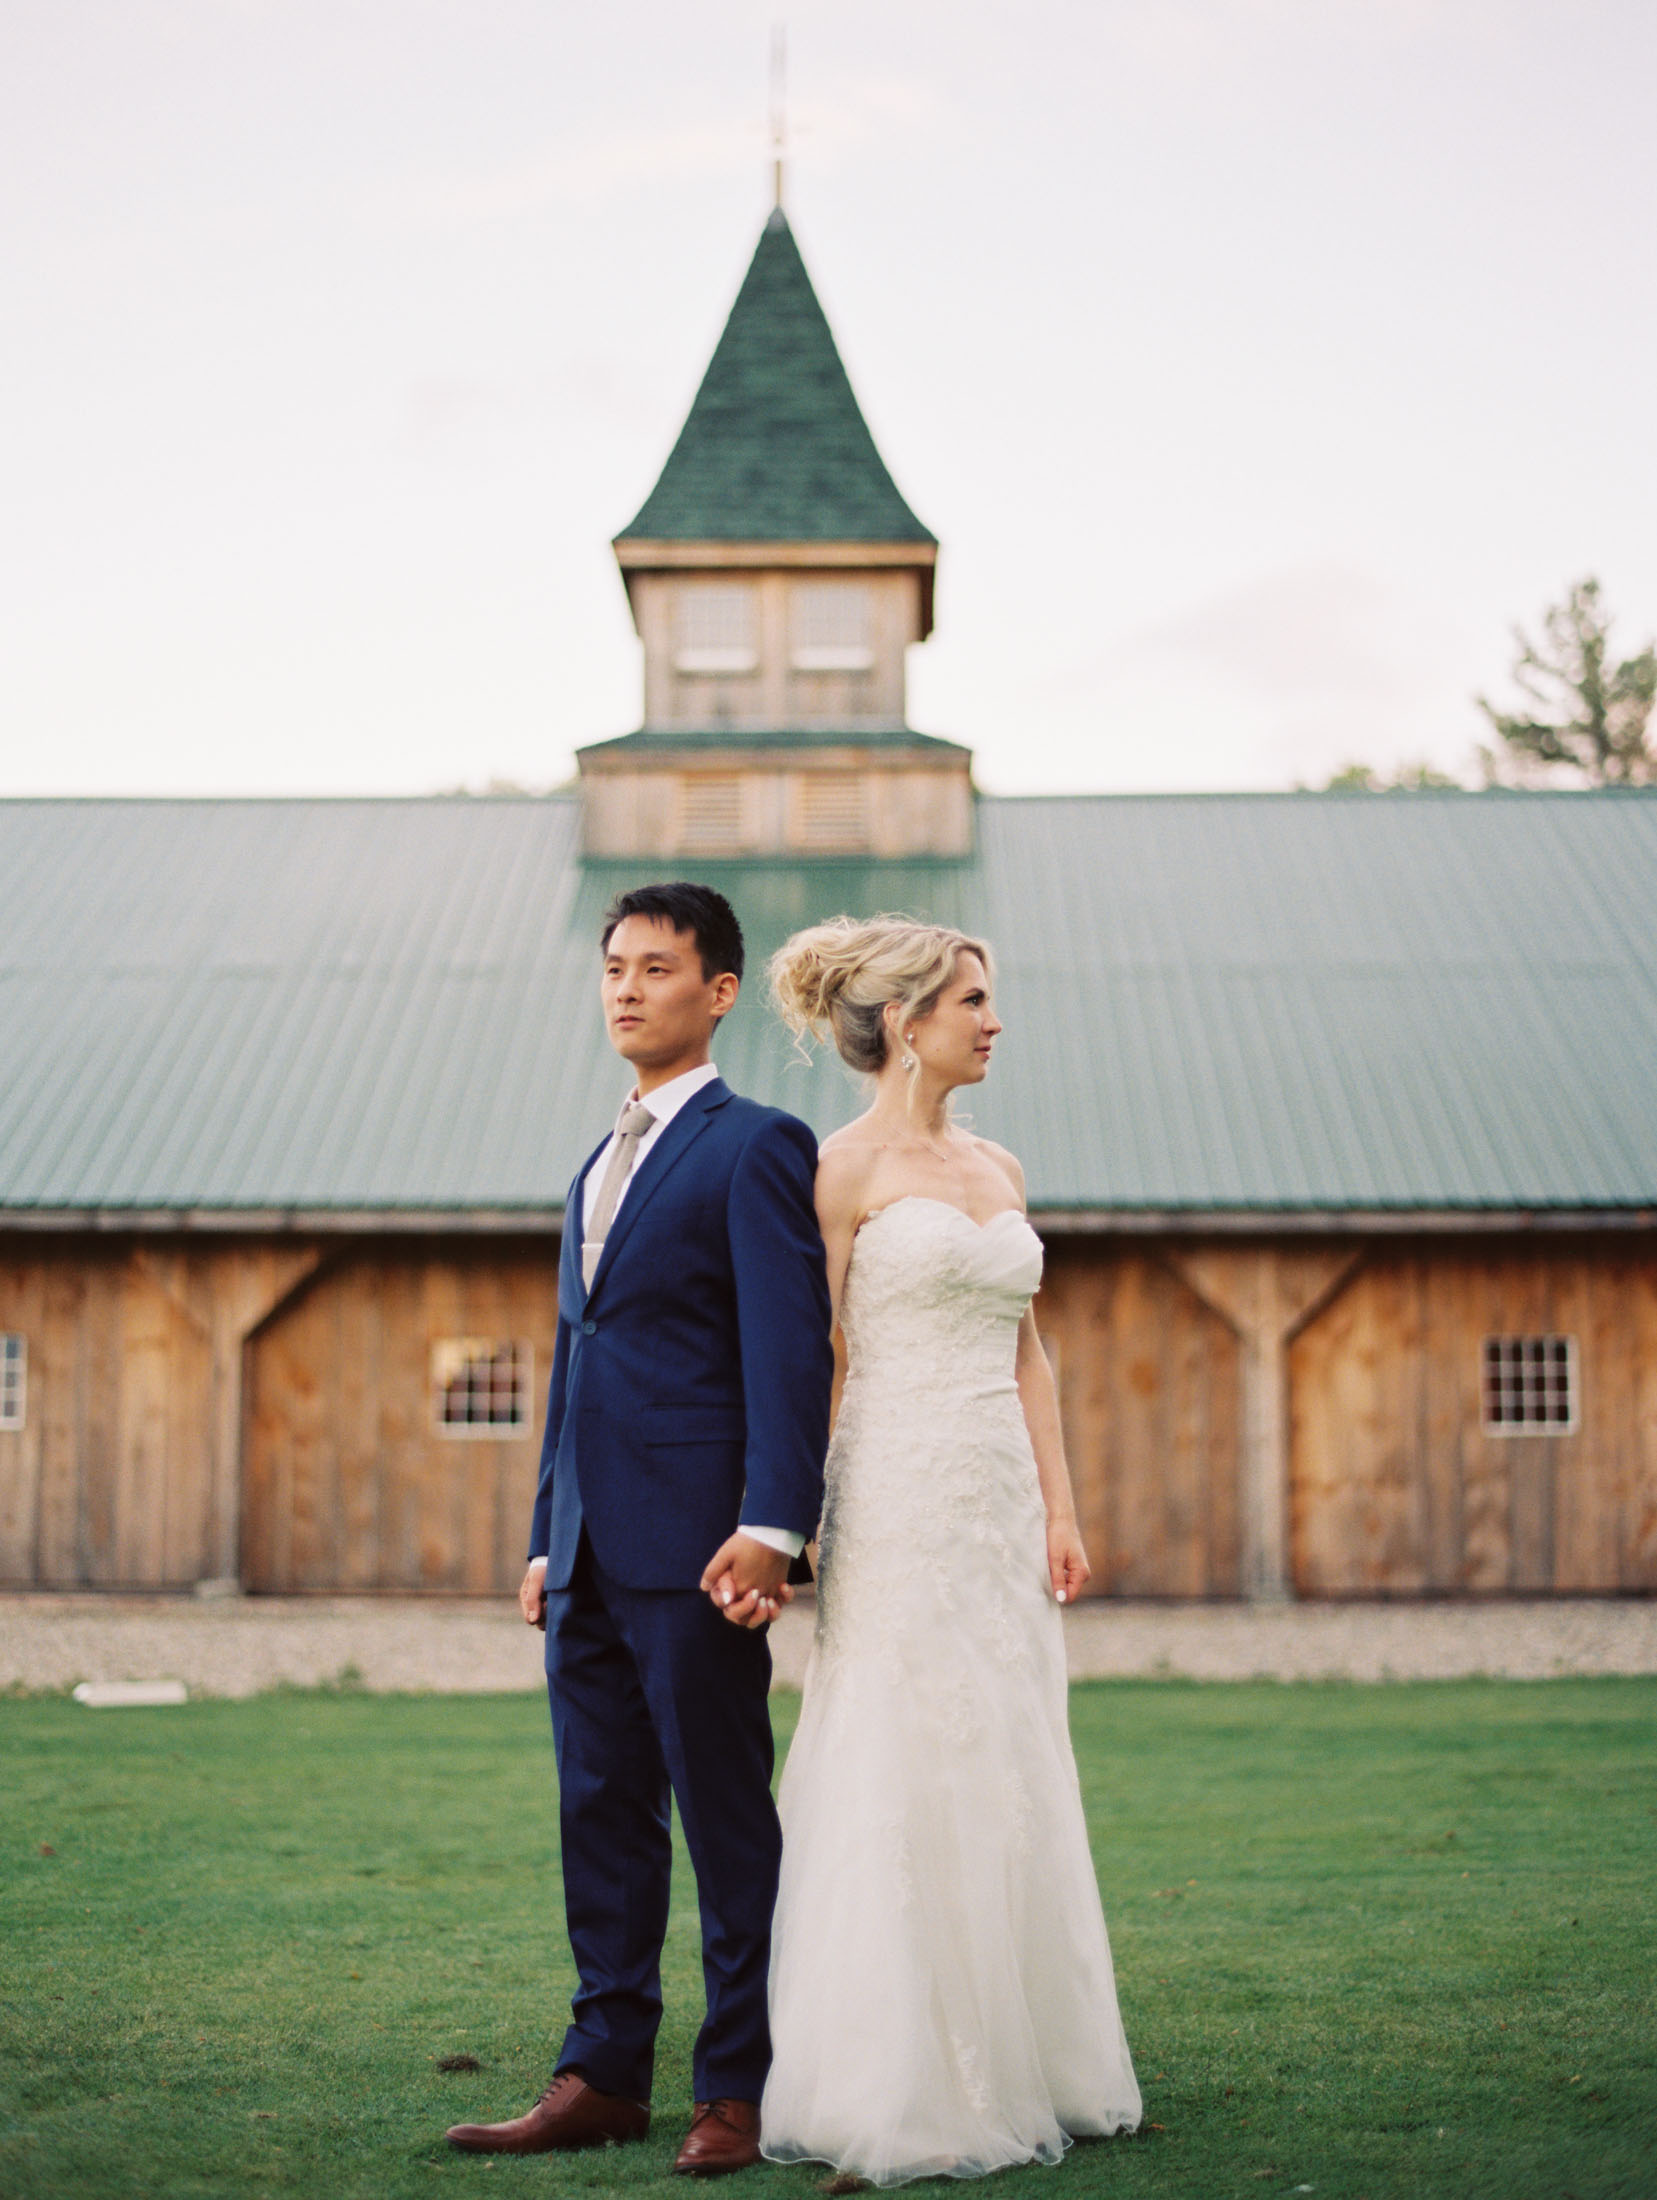 Blissful-Meadows-wedding-12.jpg